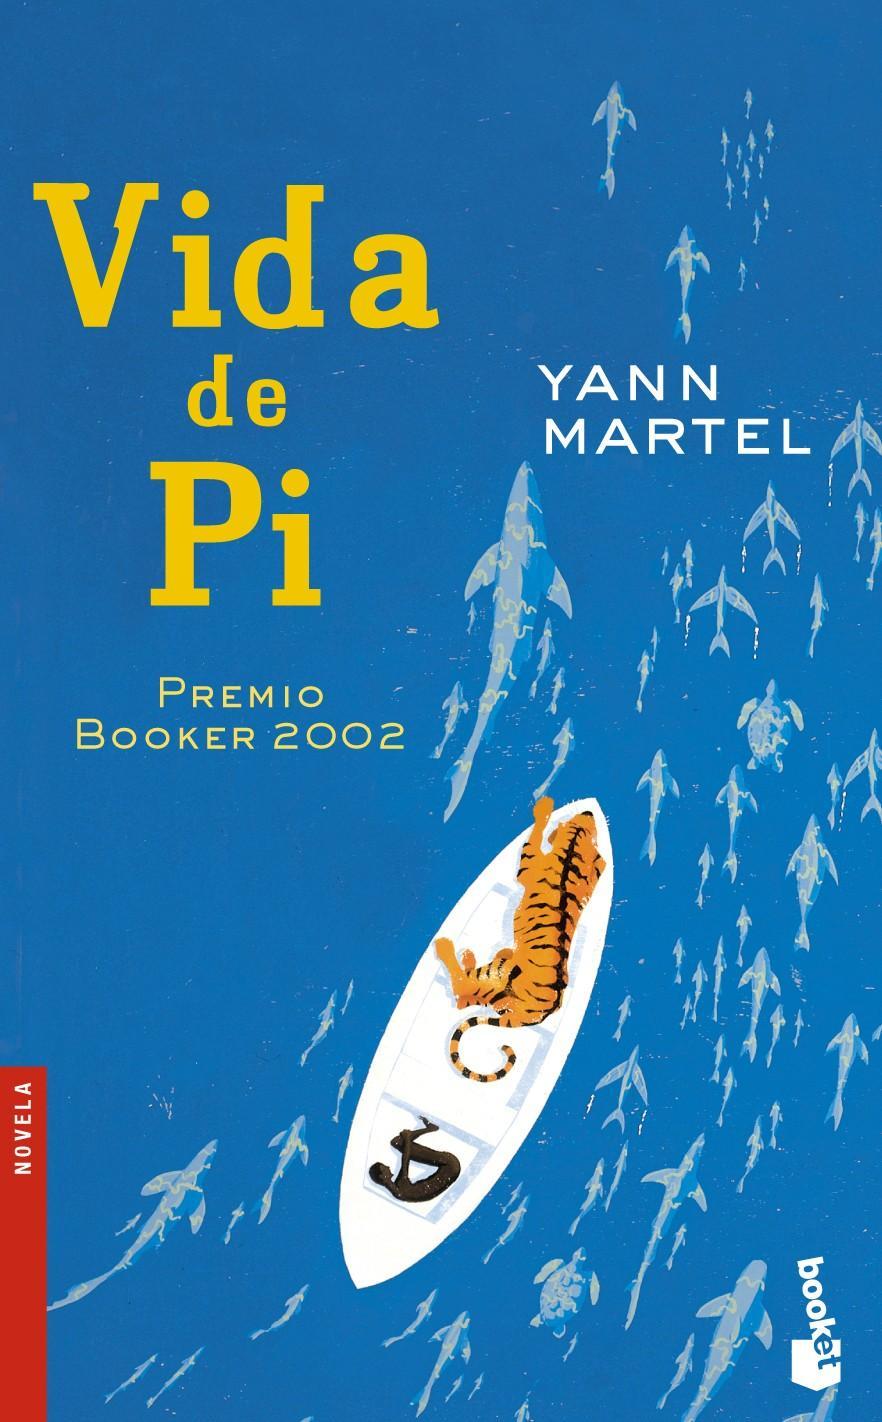 66. Life of Pi